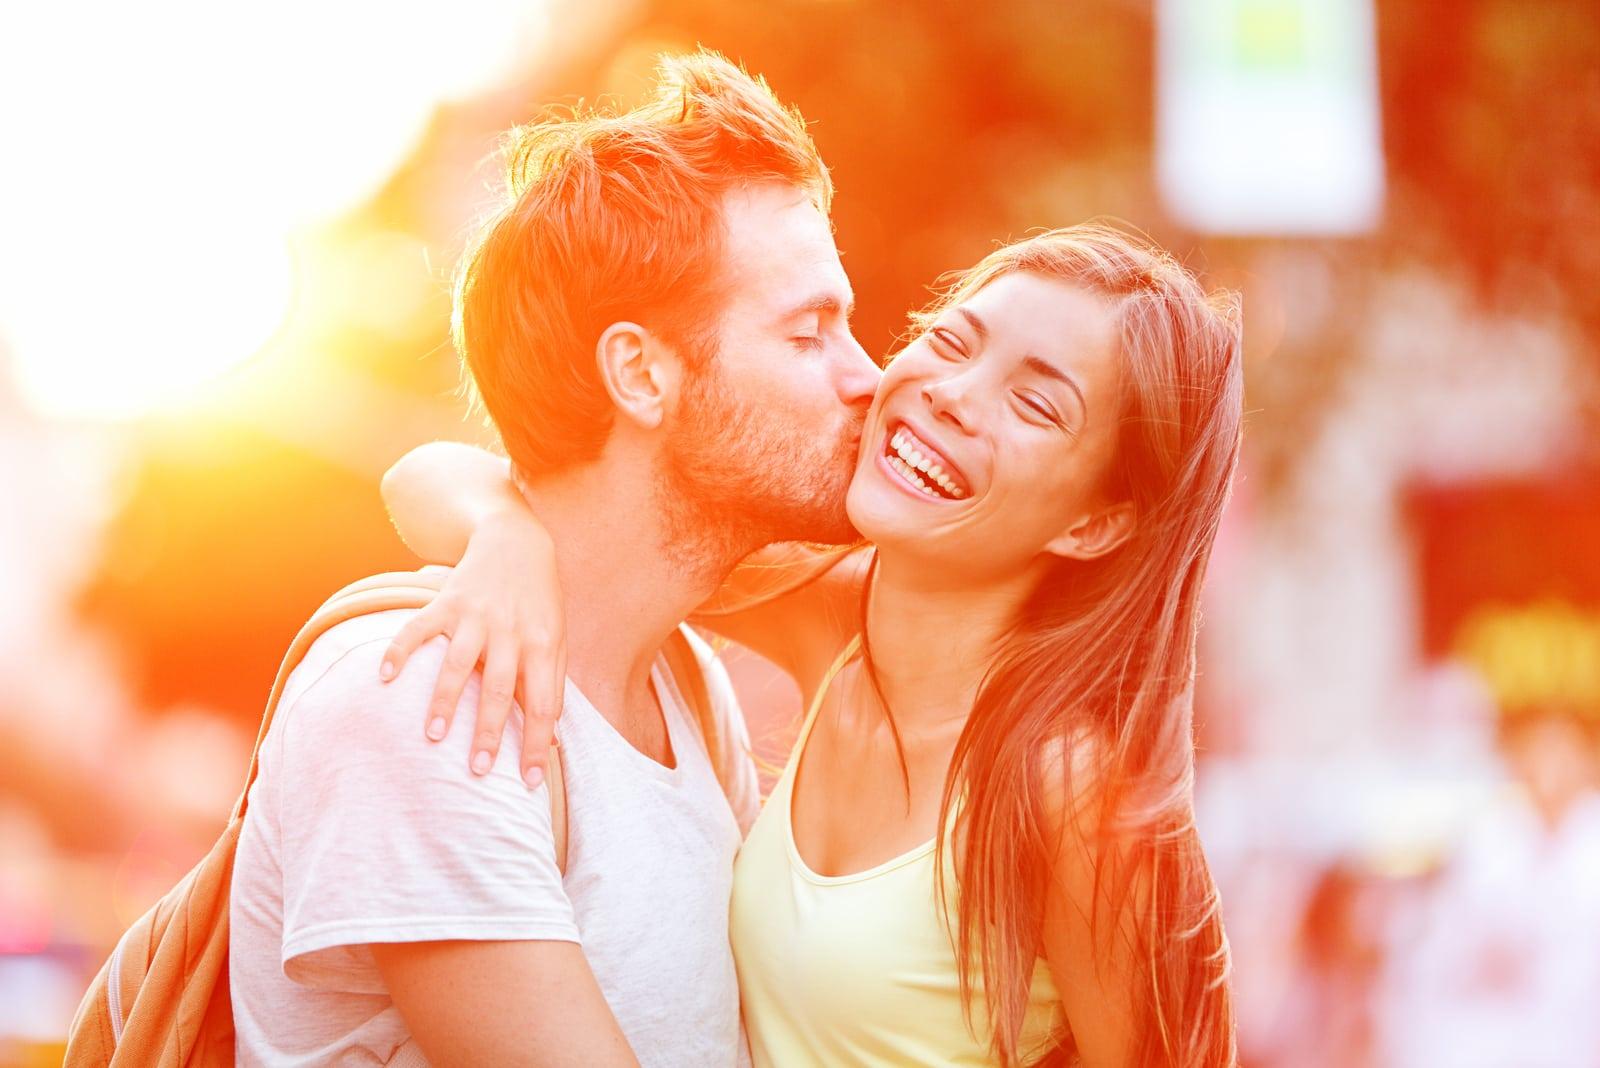 the man outside kisses the smiling girl